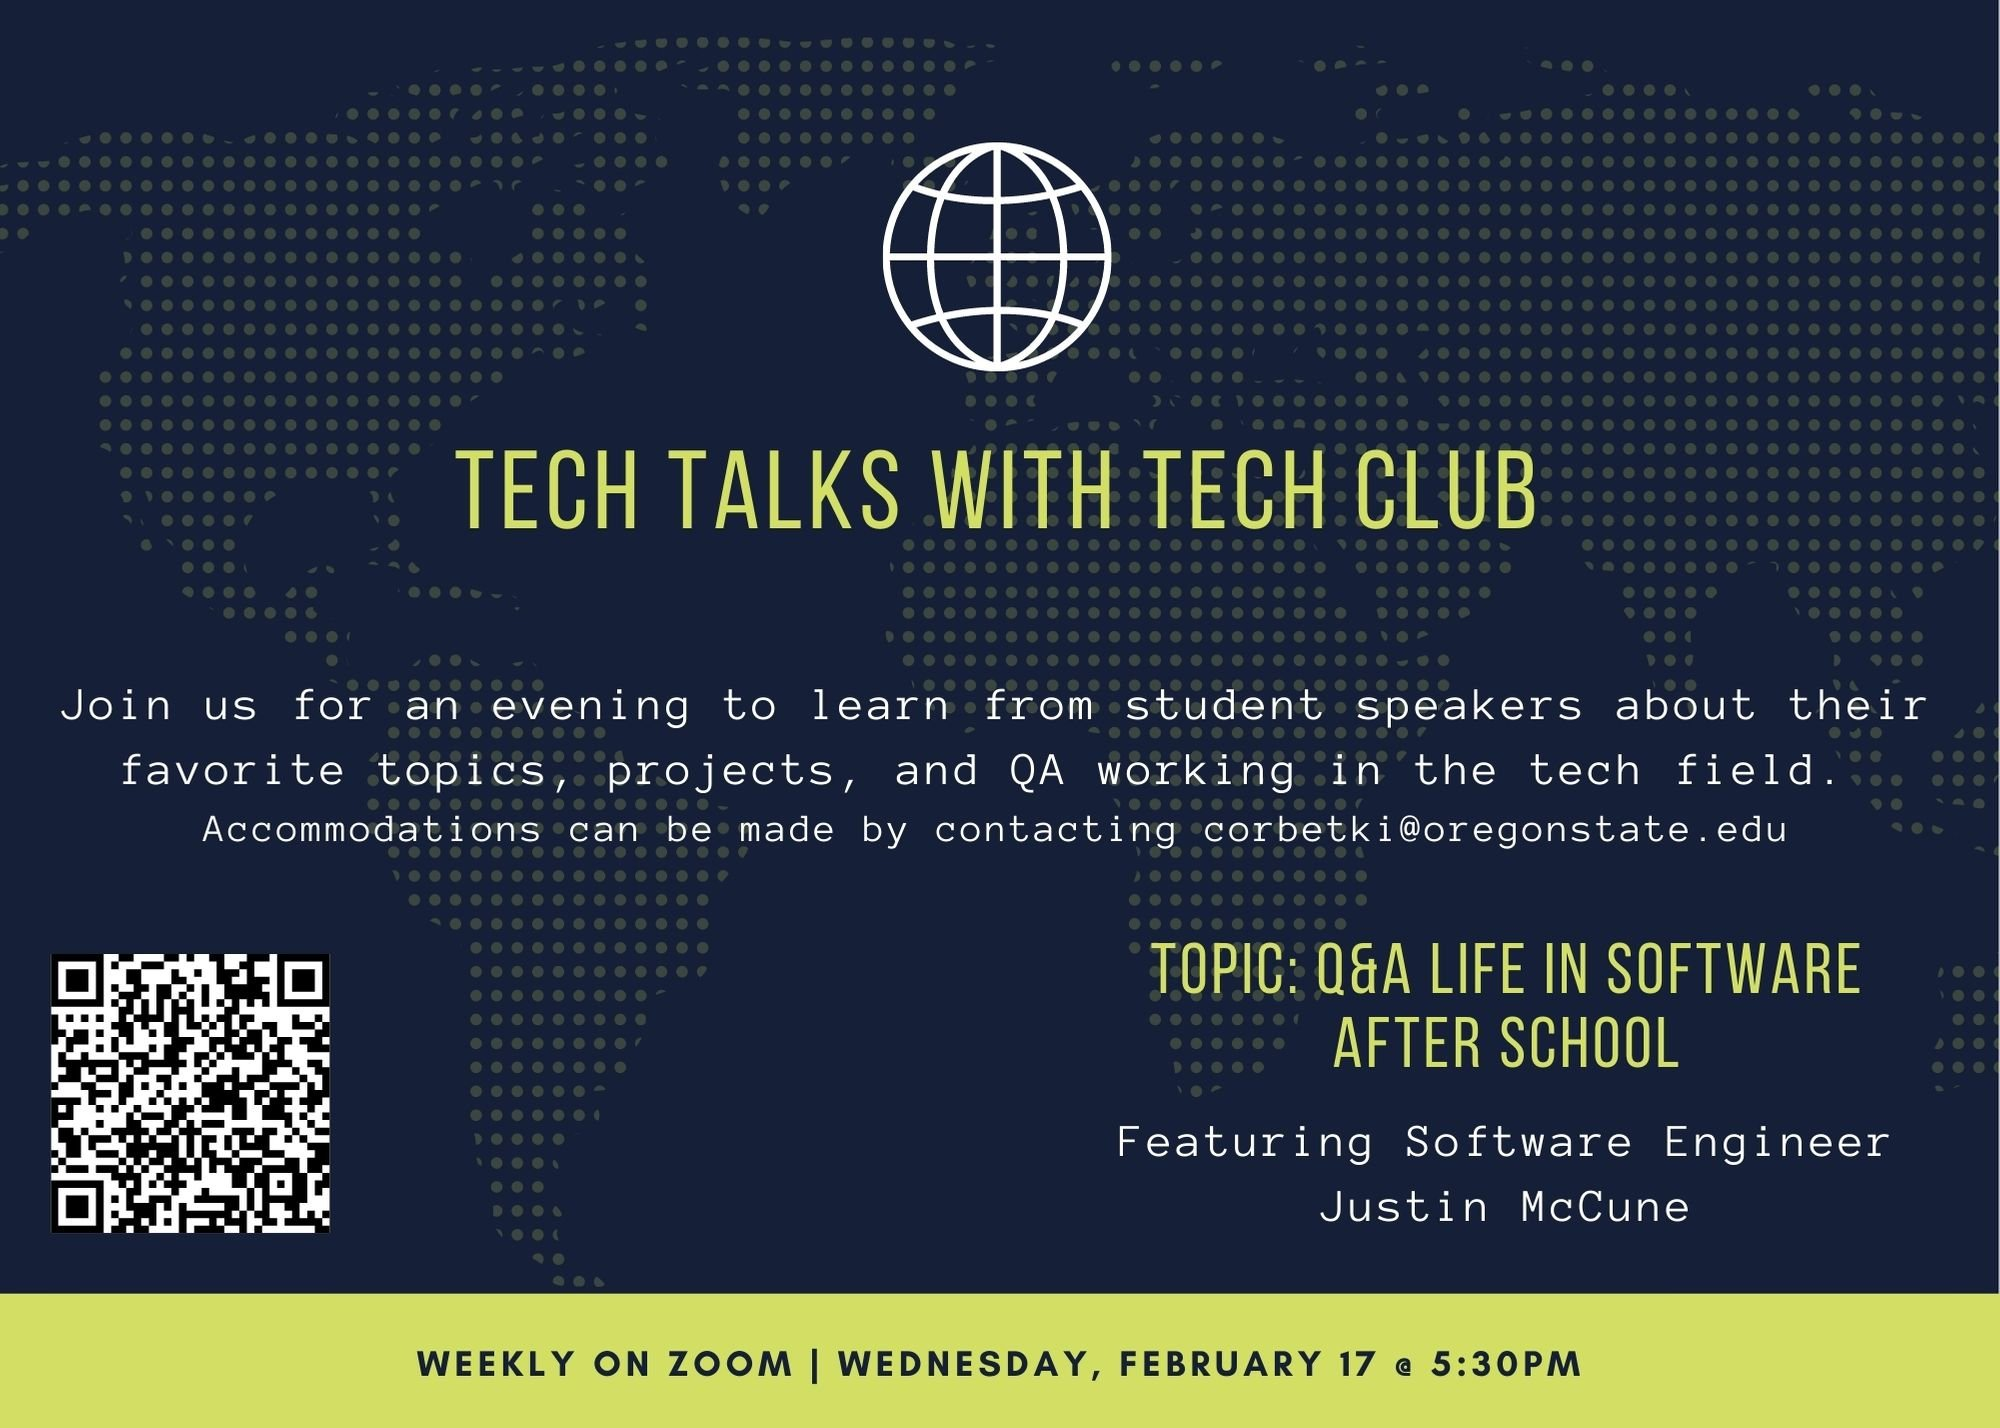 Tech Talks with Tech Club